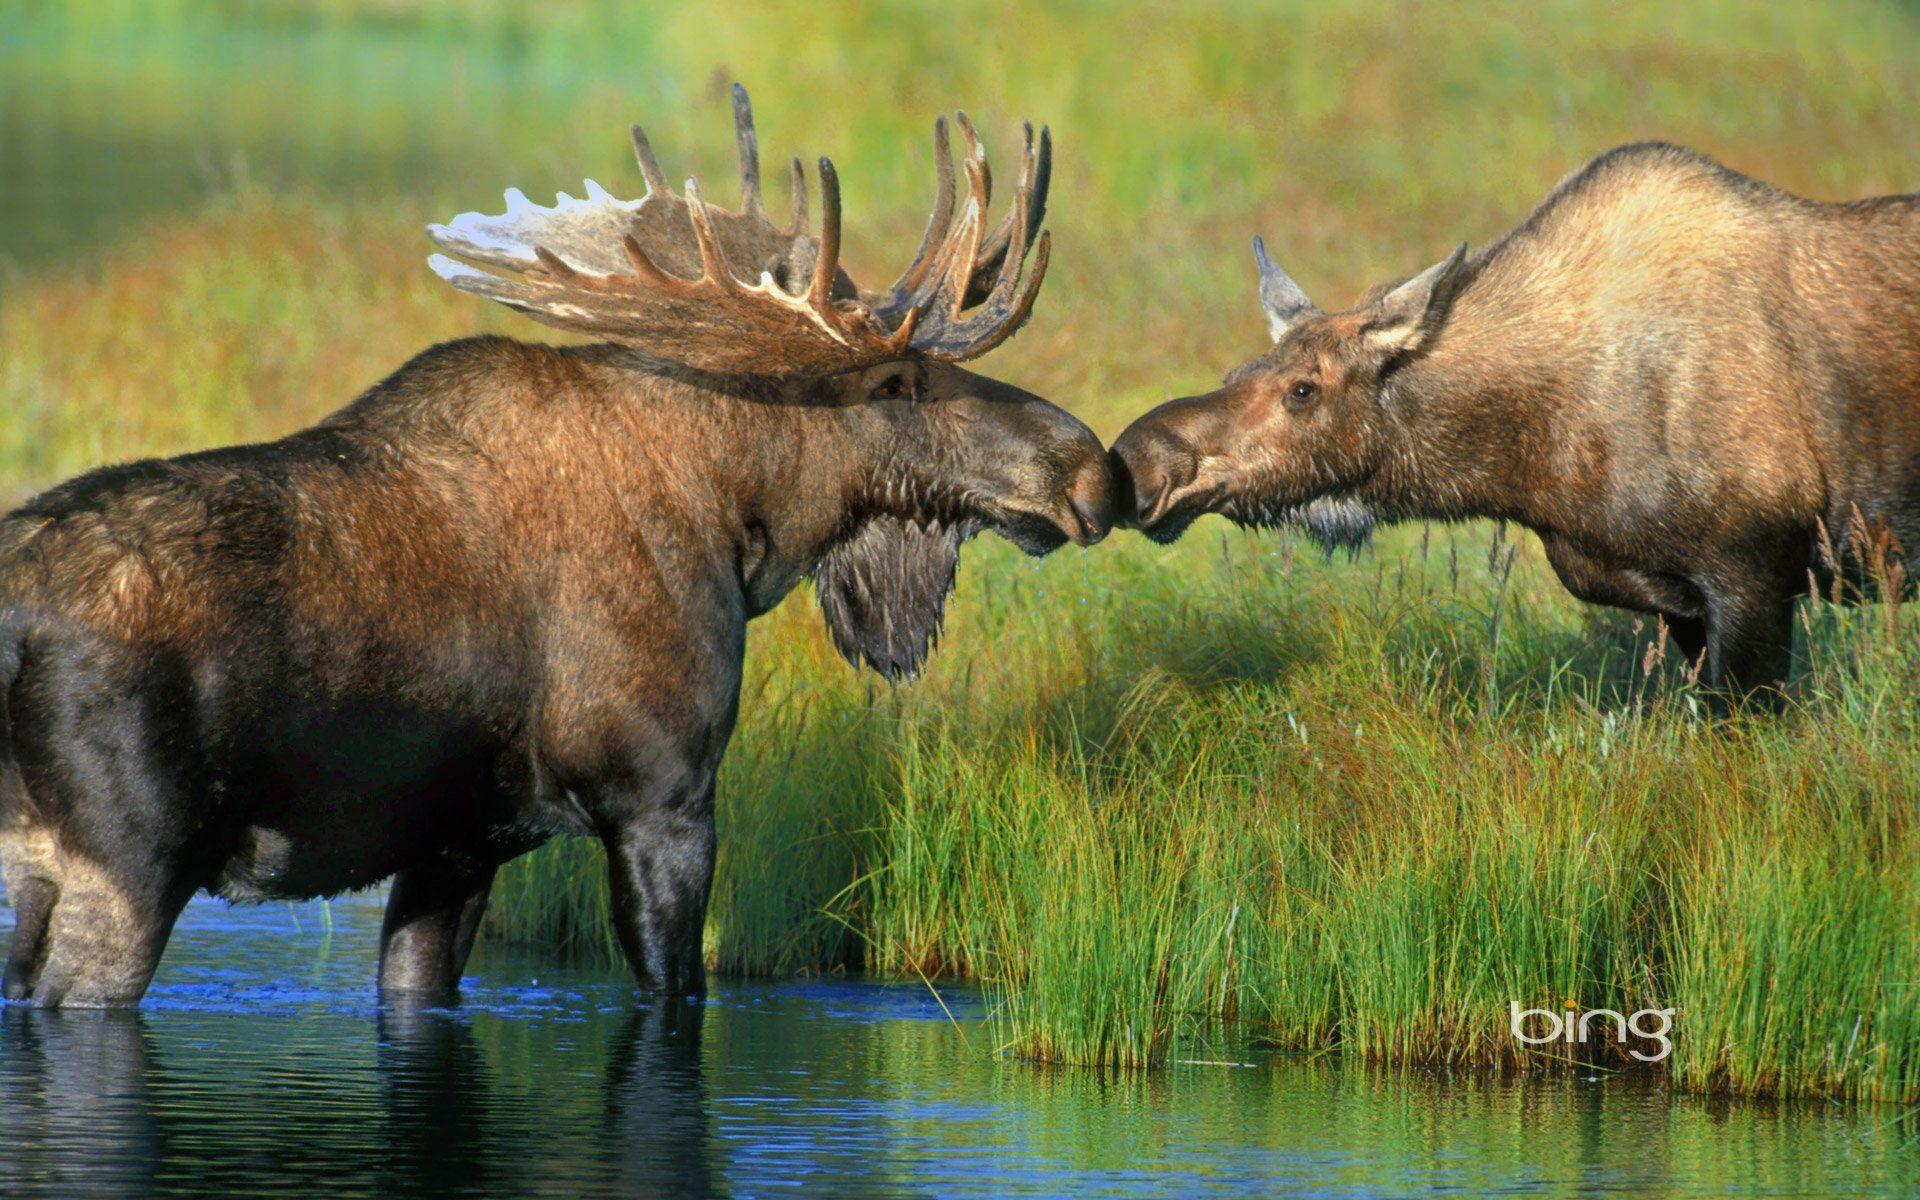 50 Moose Hd Wallpapers Backgrounds Wallpaper Abyss Moose Pictures Moose Animal Animal Wallpaper